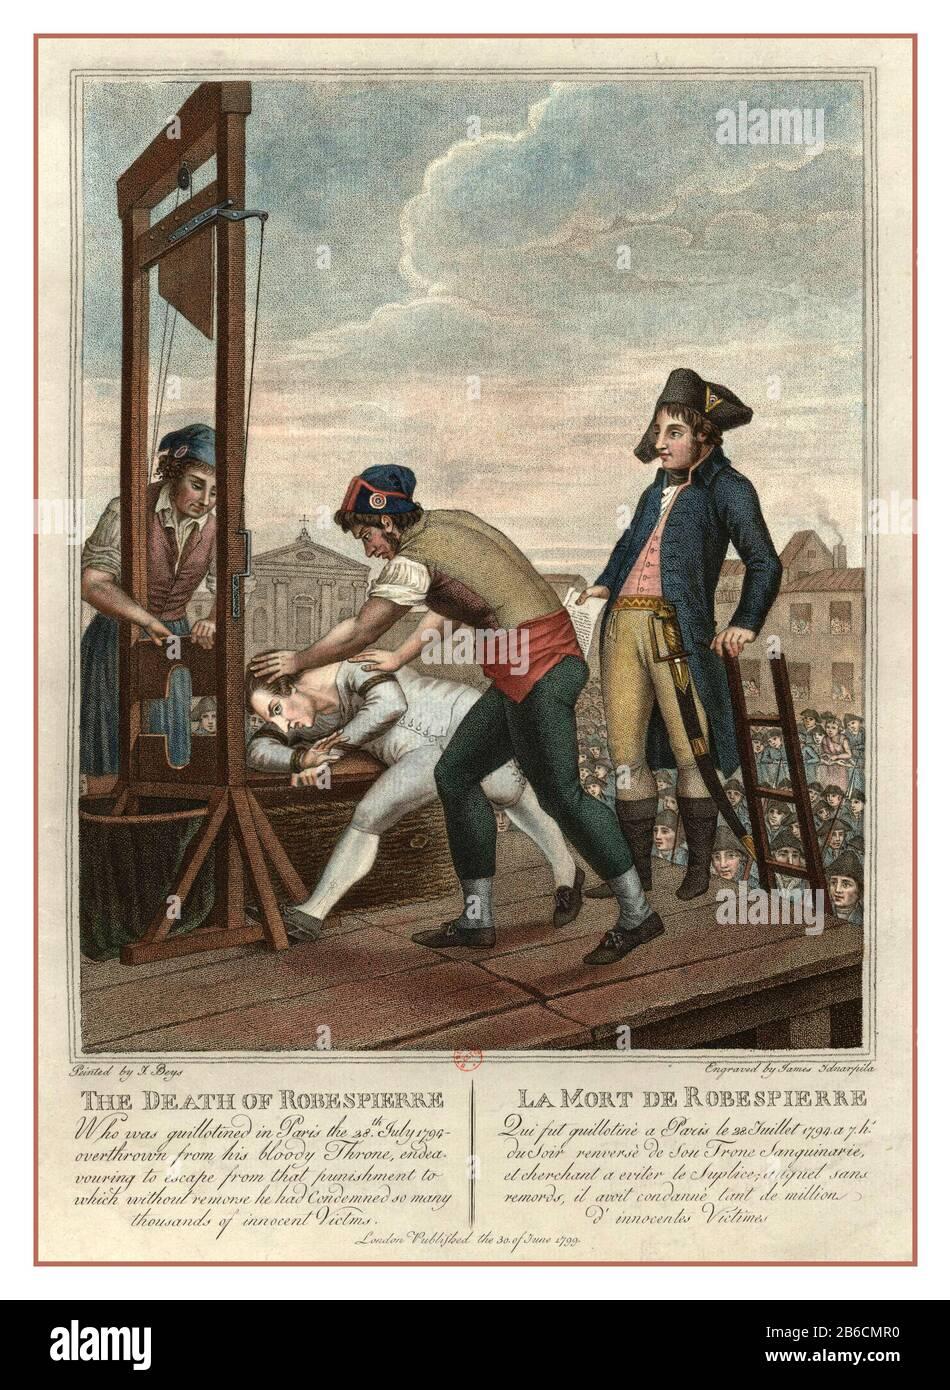 Robespierre Tod